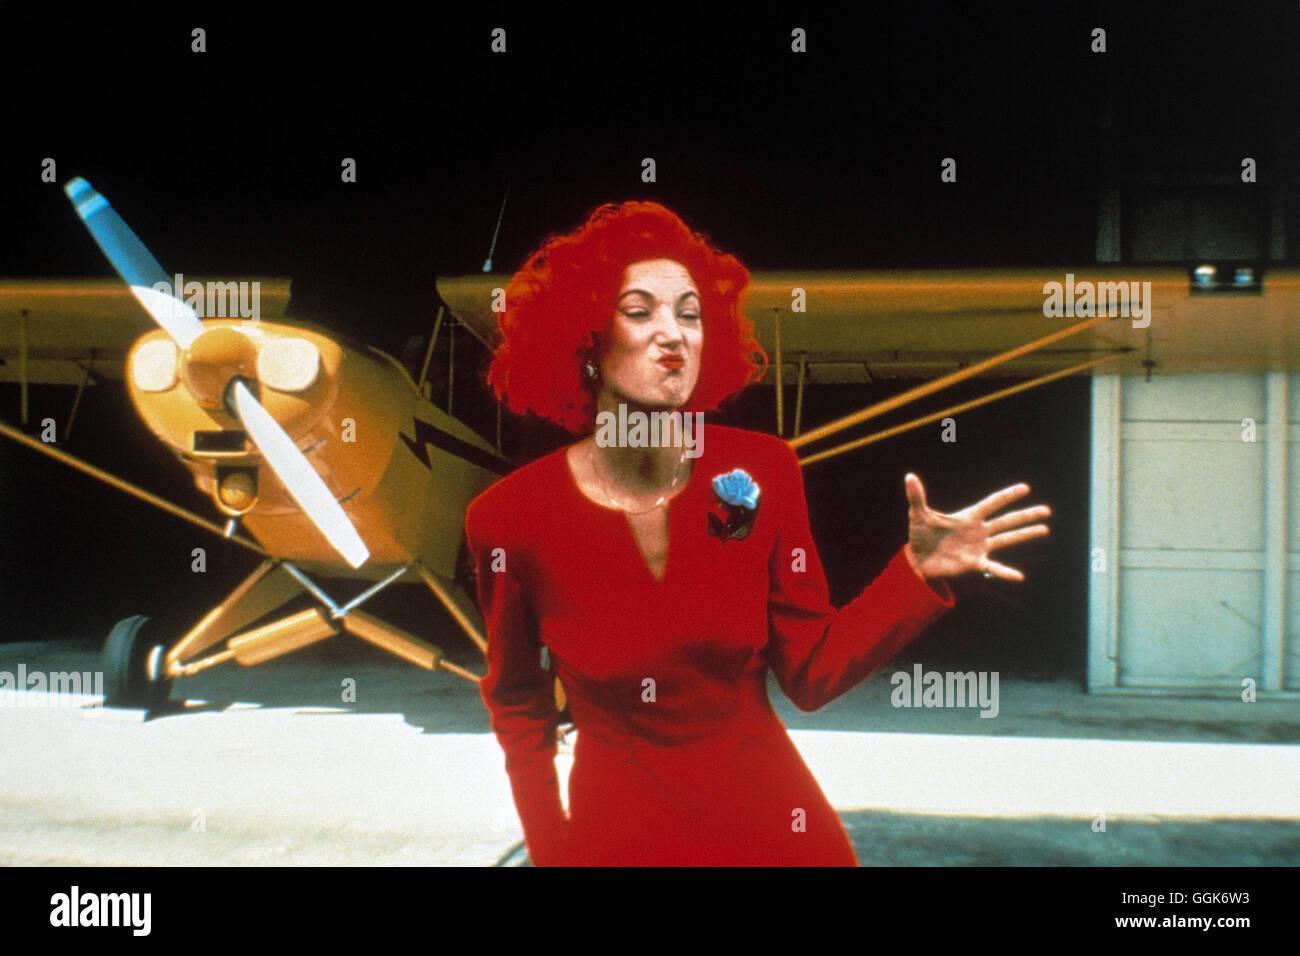 e393e3ac5d0 TWIN PEAKS / Twin Peaks USA/F 1992 / David Lynch Lil the Dancer (KIMBERLY  ANN COLE) Regie: David Lynch aka. Twin Peaks